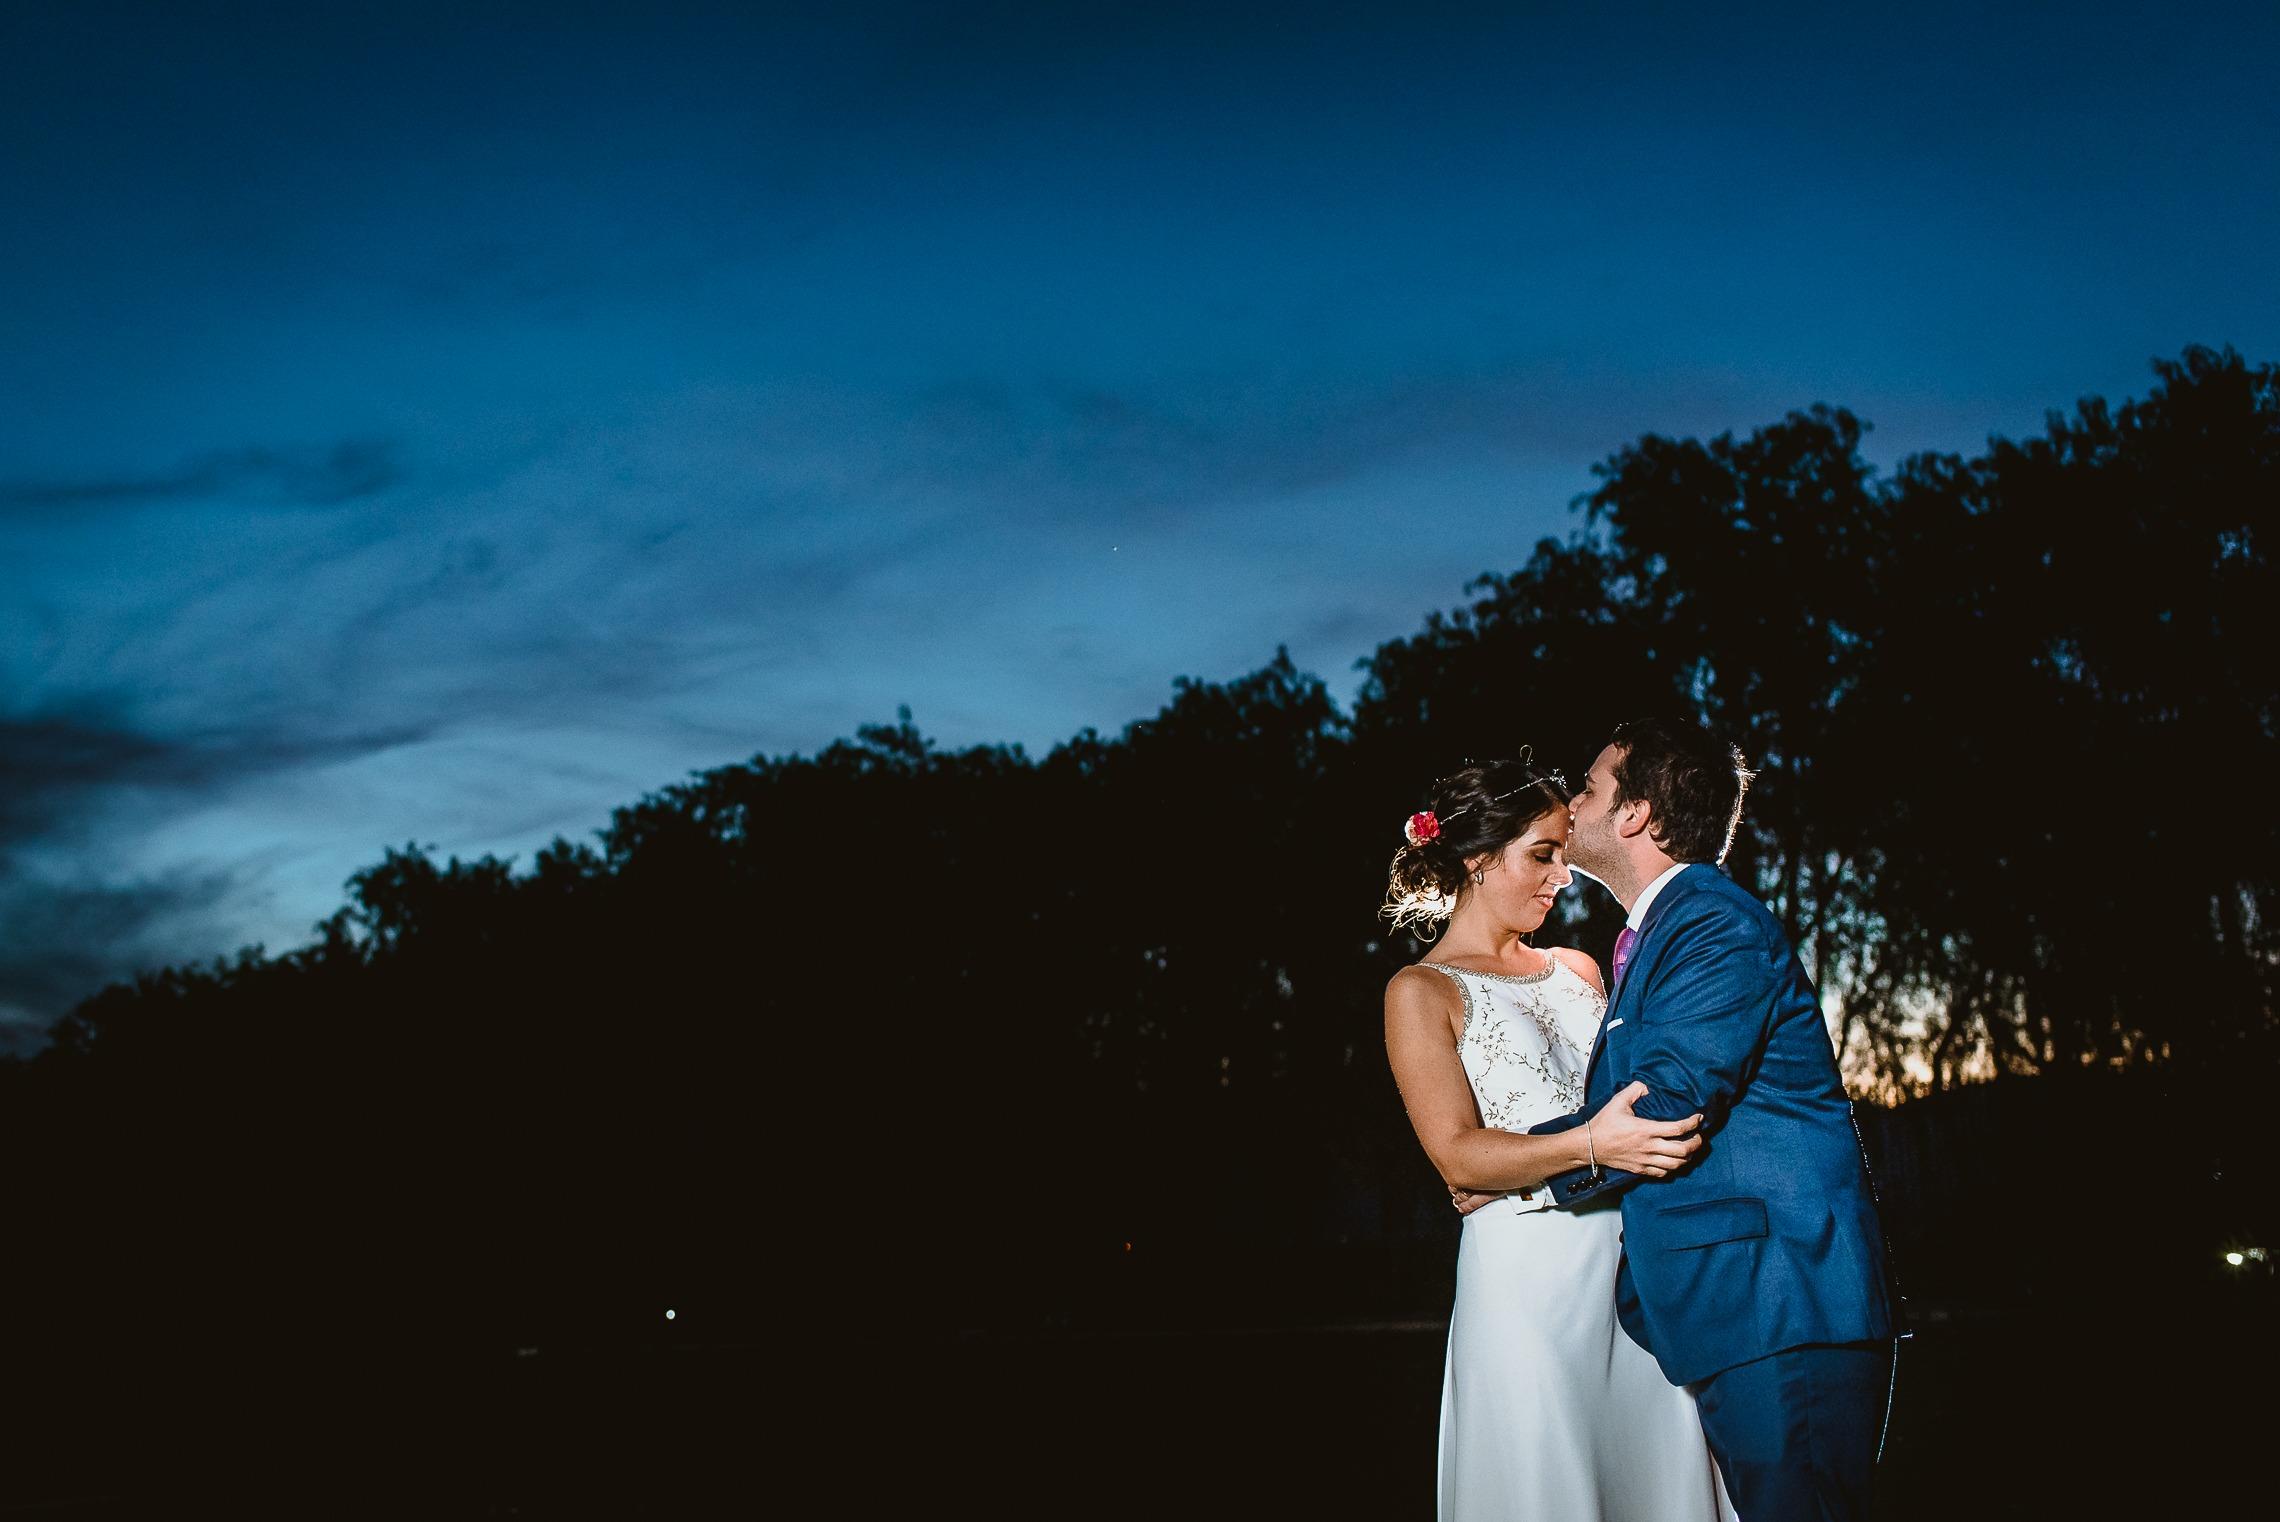 parque-san-rafael-deborah-dantzoff-fotografo-de-matrimonios-destination-wedding-photographer-fotografia-chile